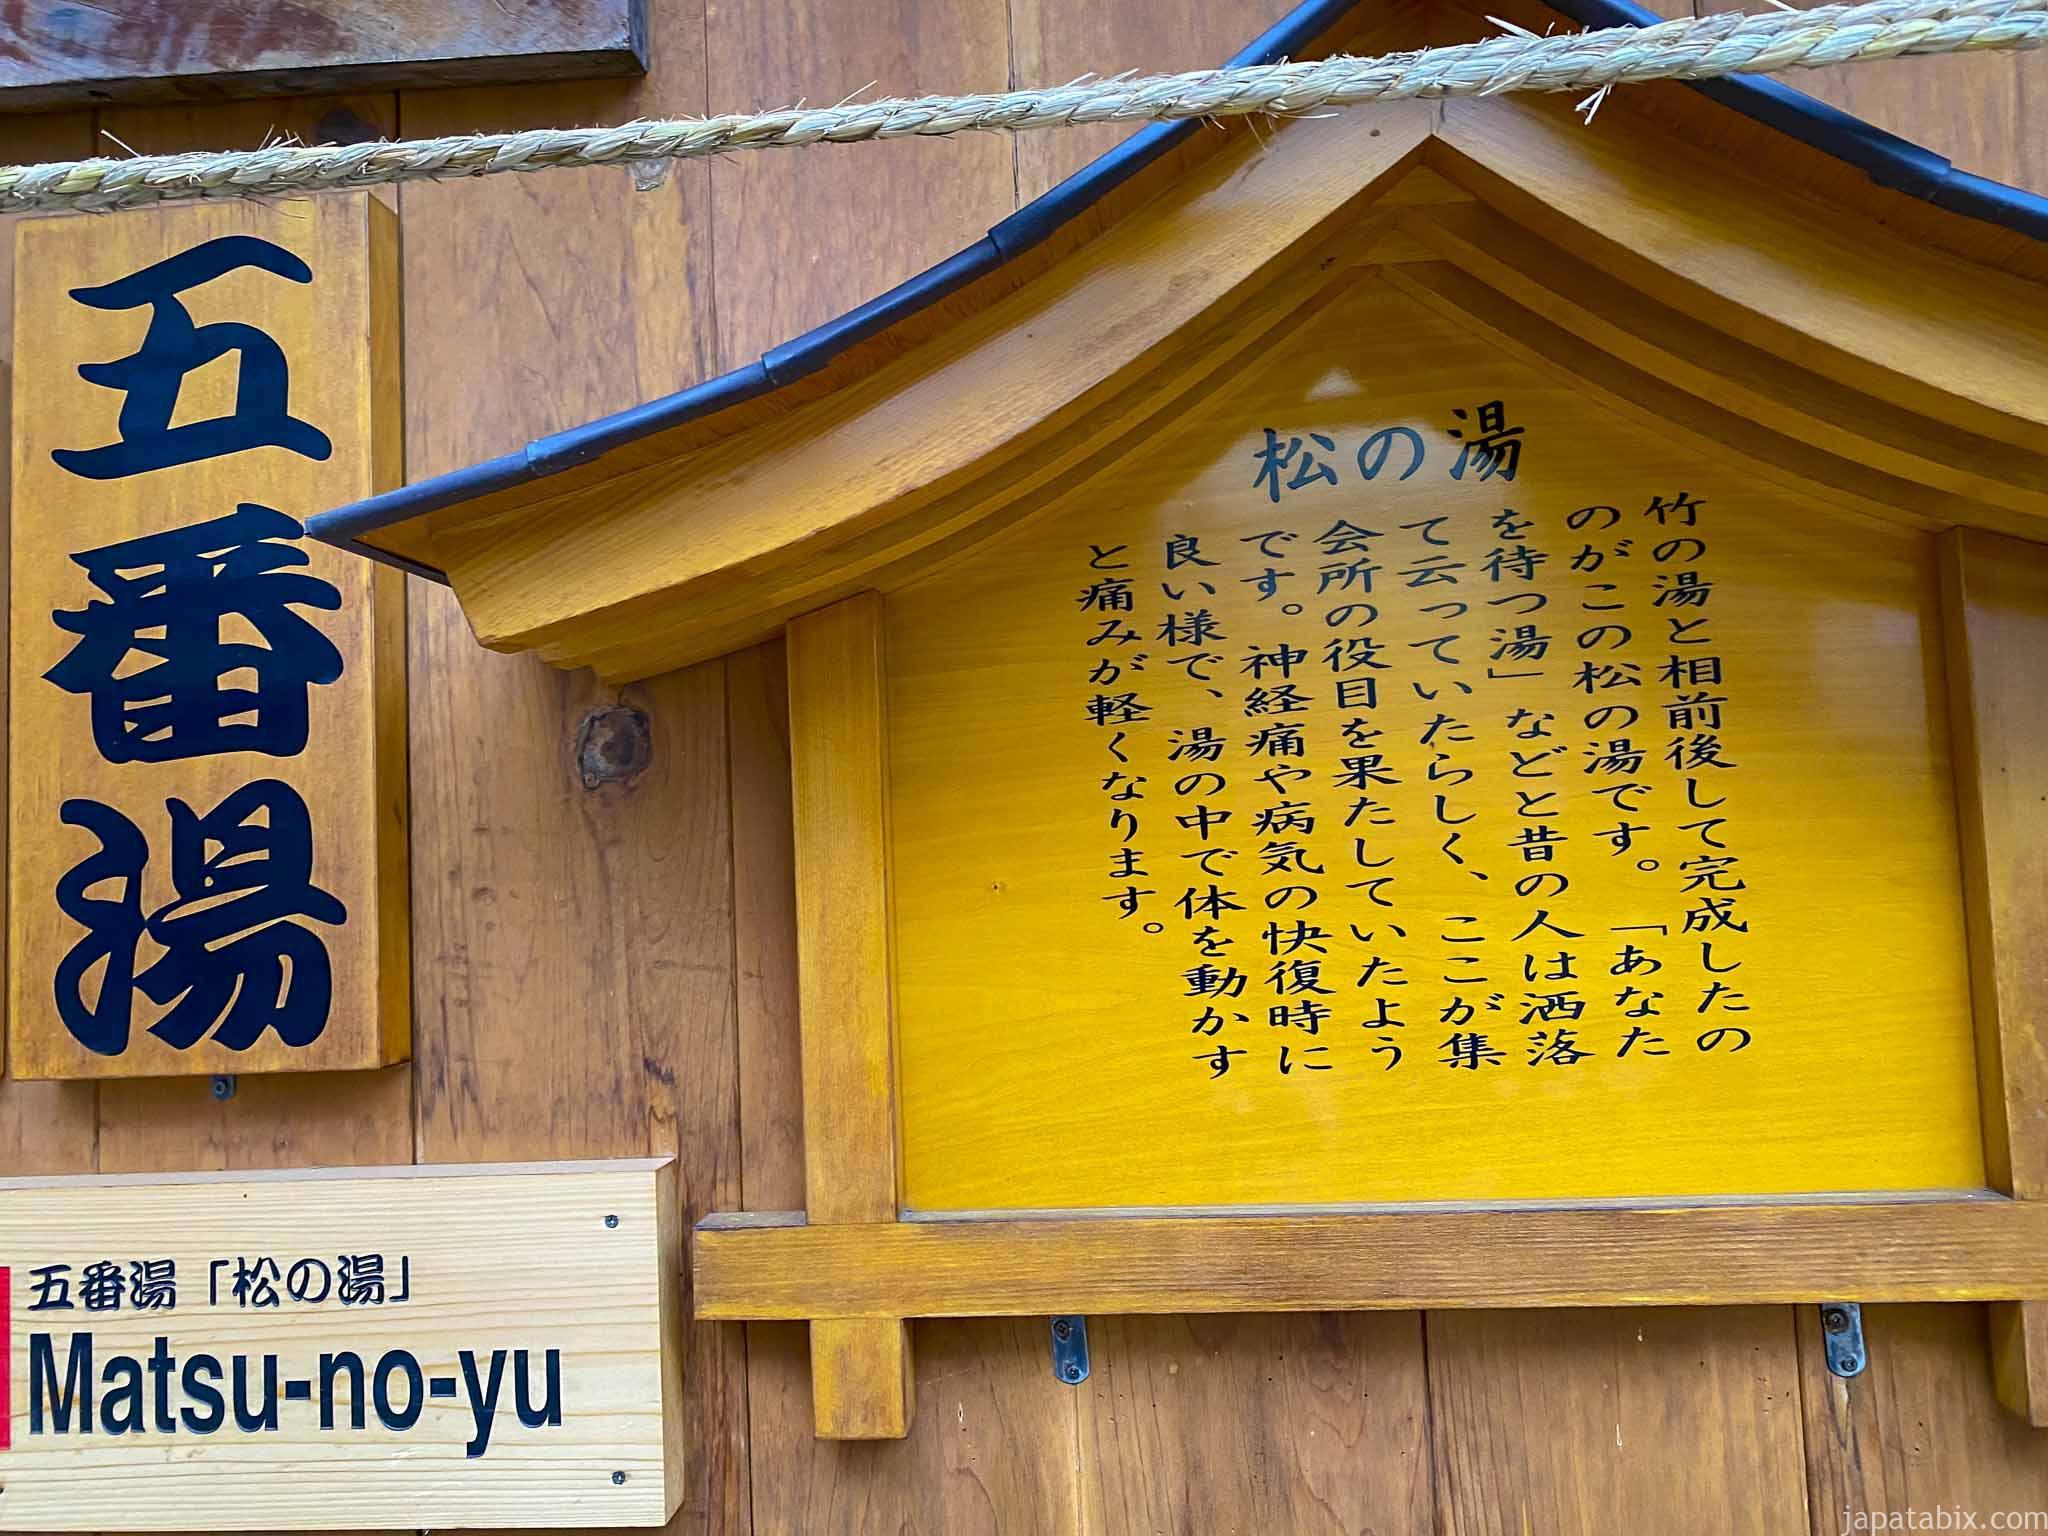 渋温泉 外湯 五番湯 松の湯